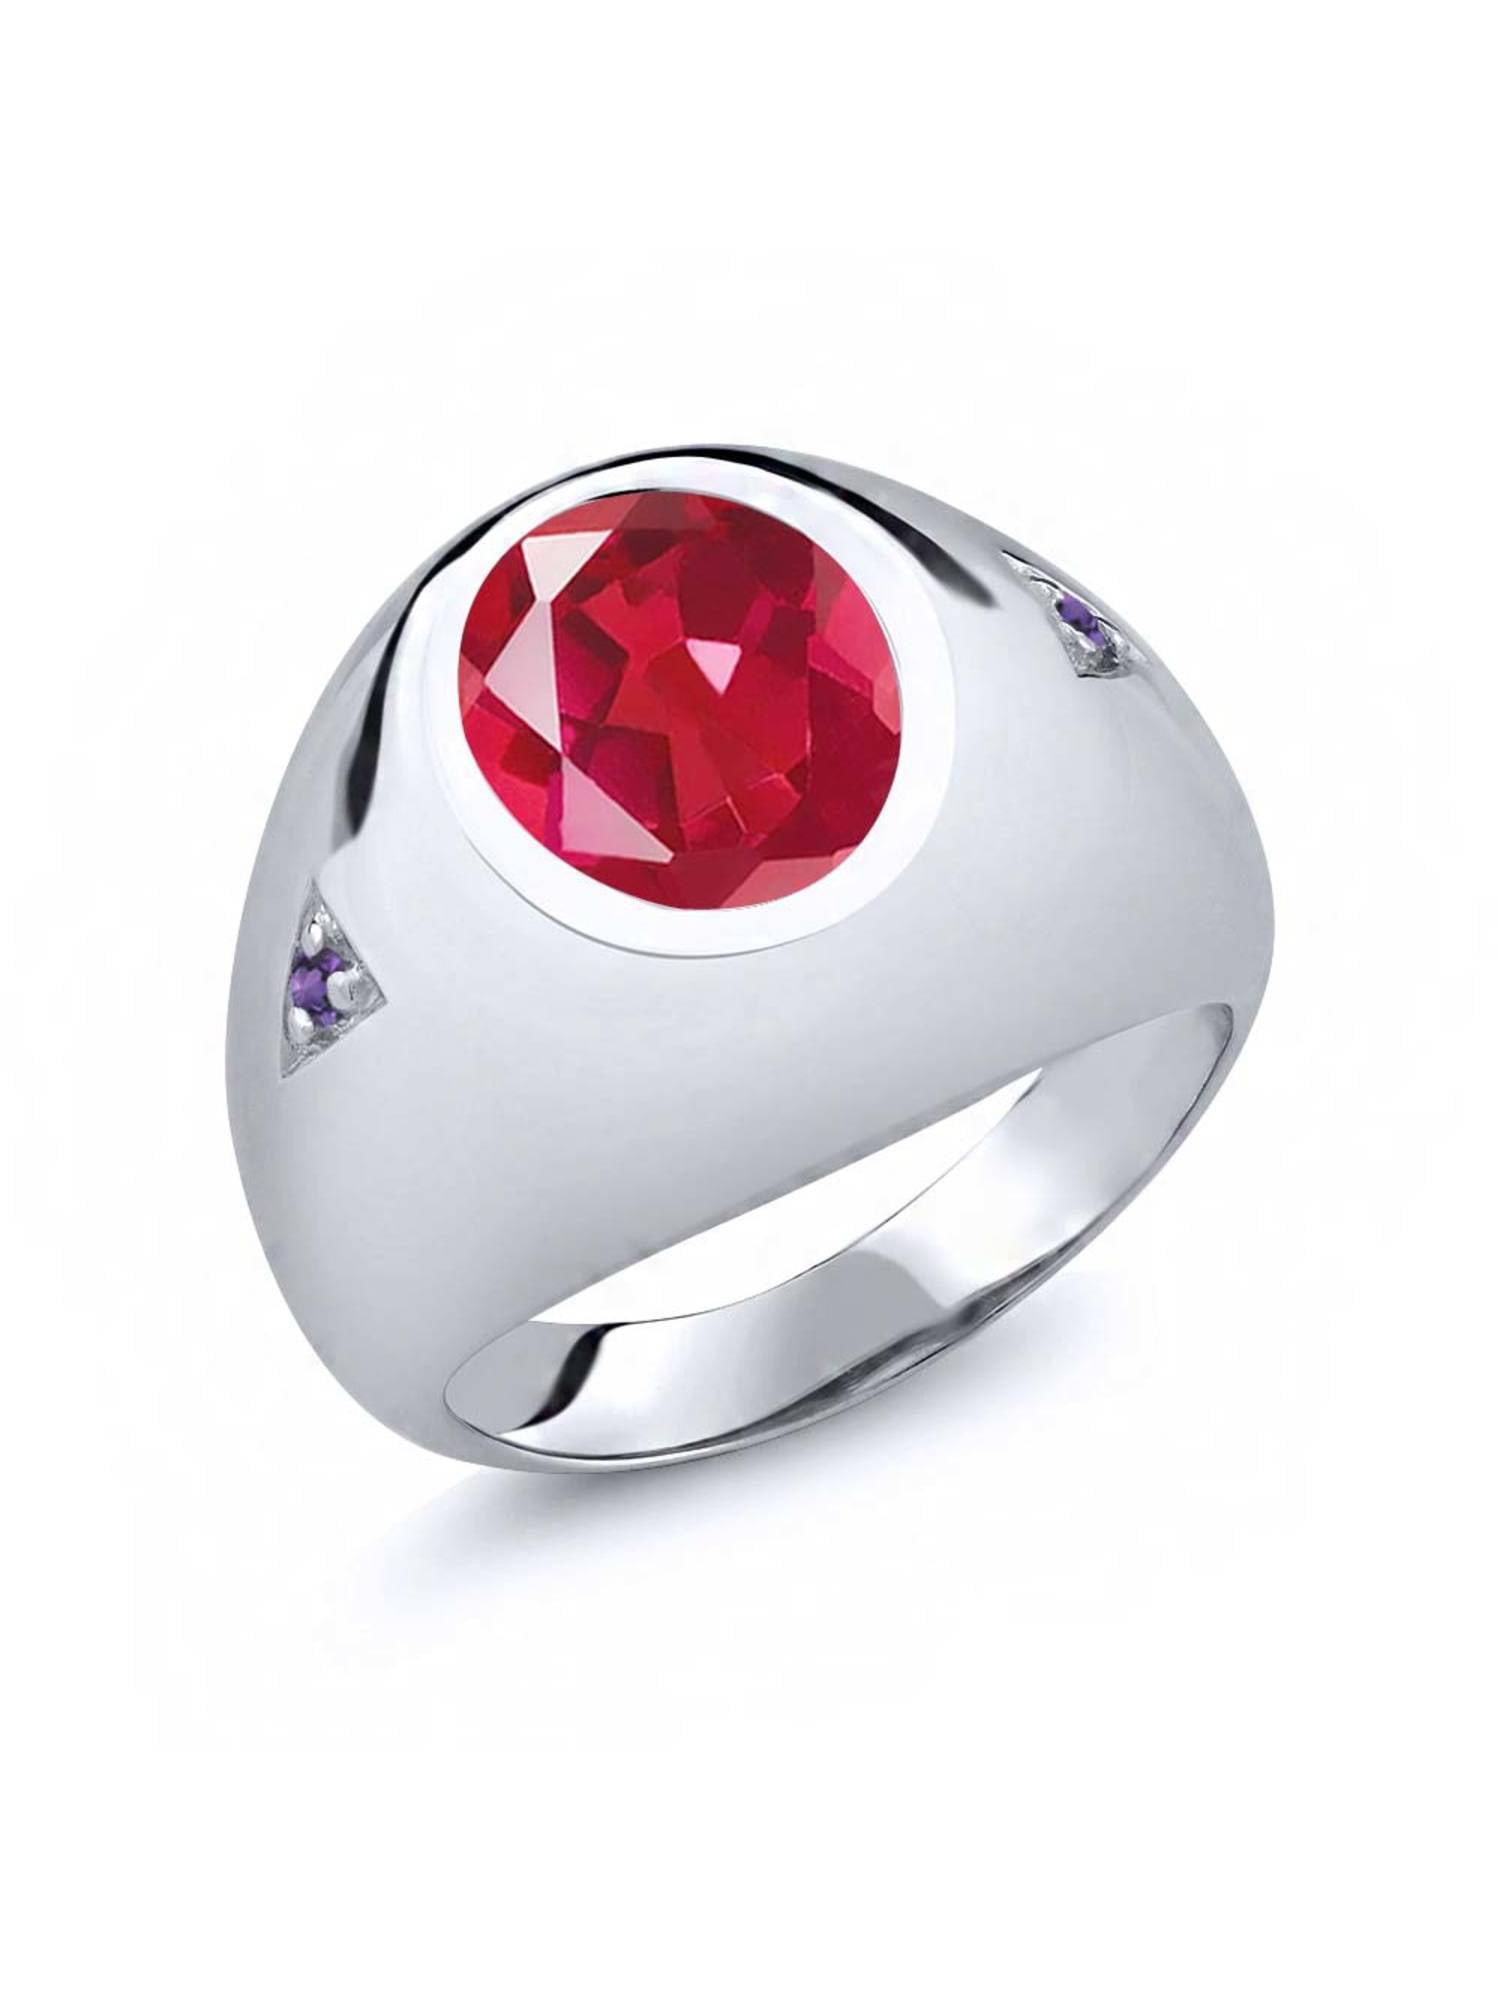 4.08 Ct Last Dance Pink Mystic Quartz Purple Amethyst 925 Silver Men's Ring by